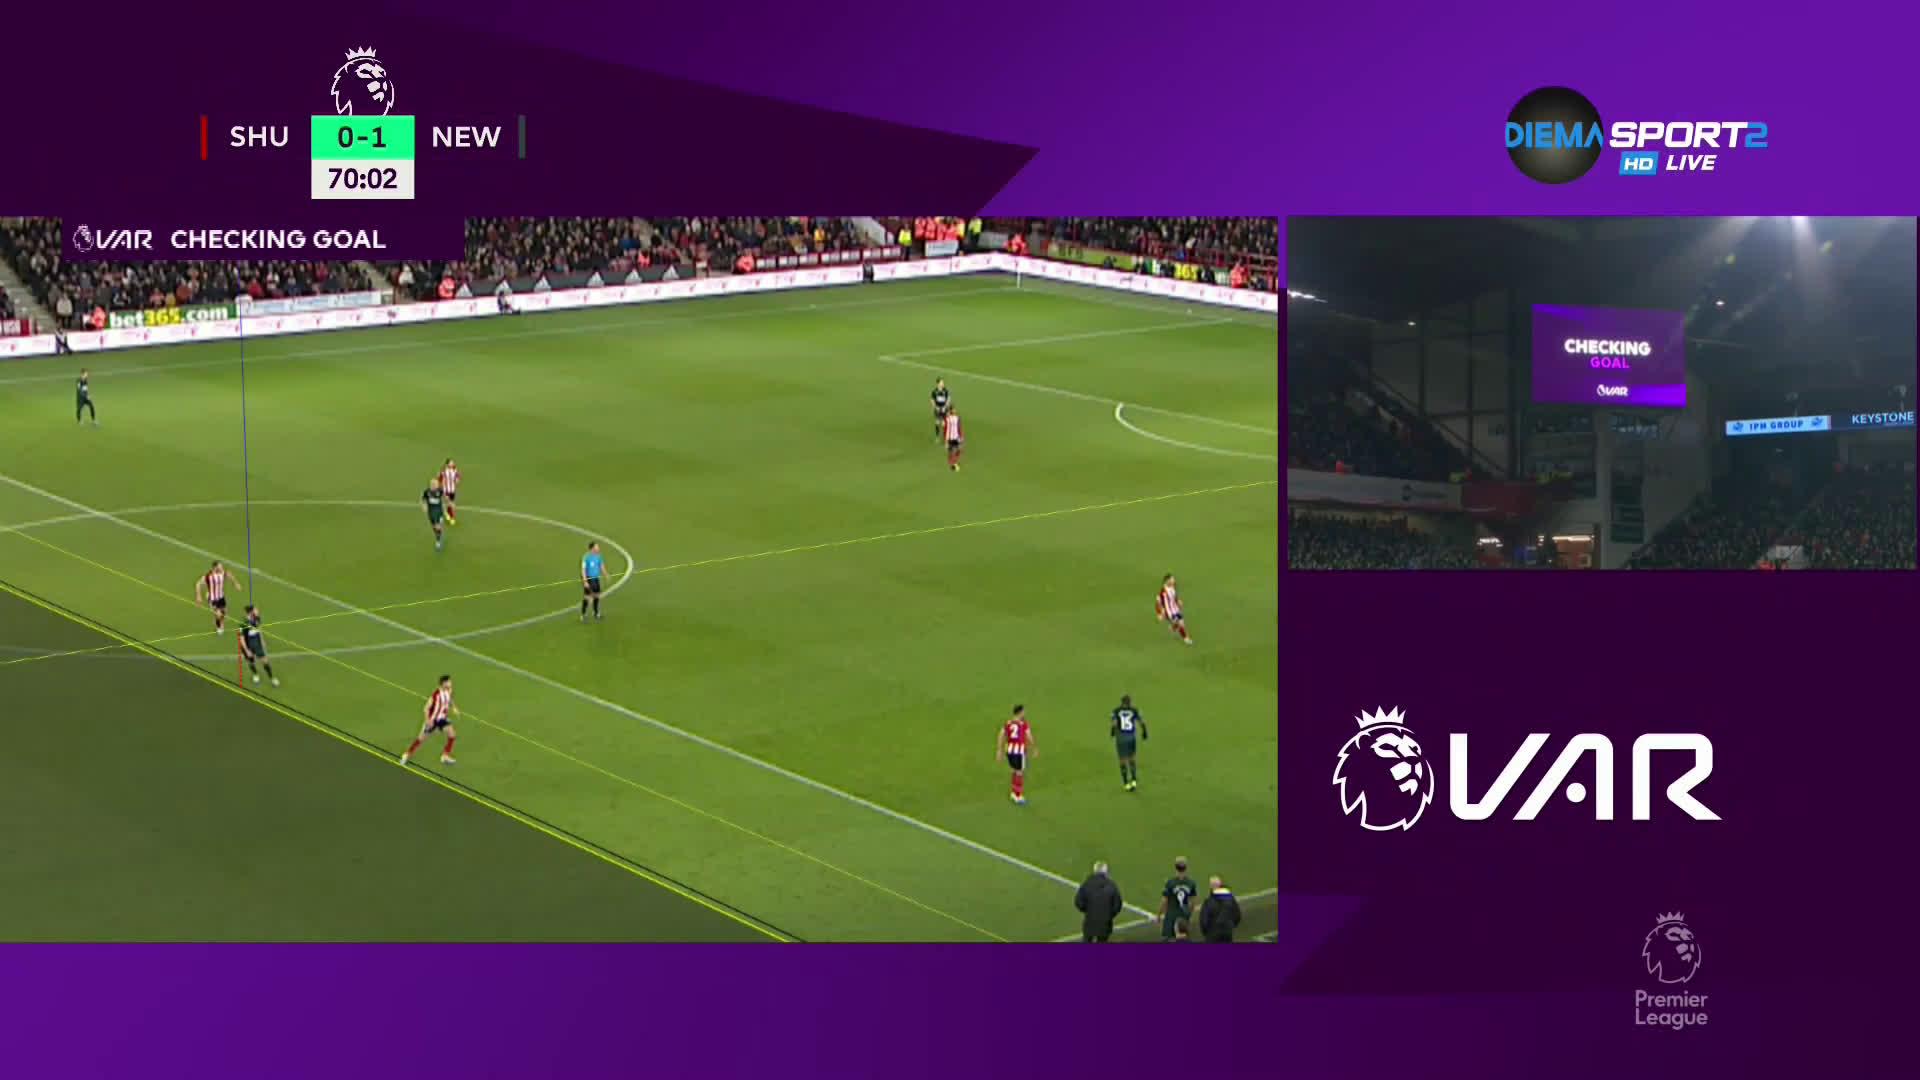 Шефийлд Юнайтед - Нюкасъл 0:2 /репортаж/